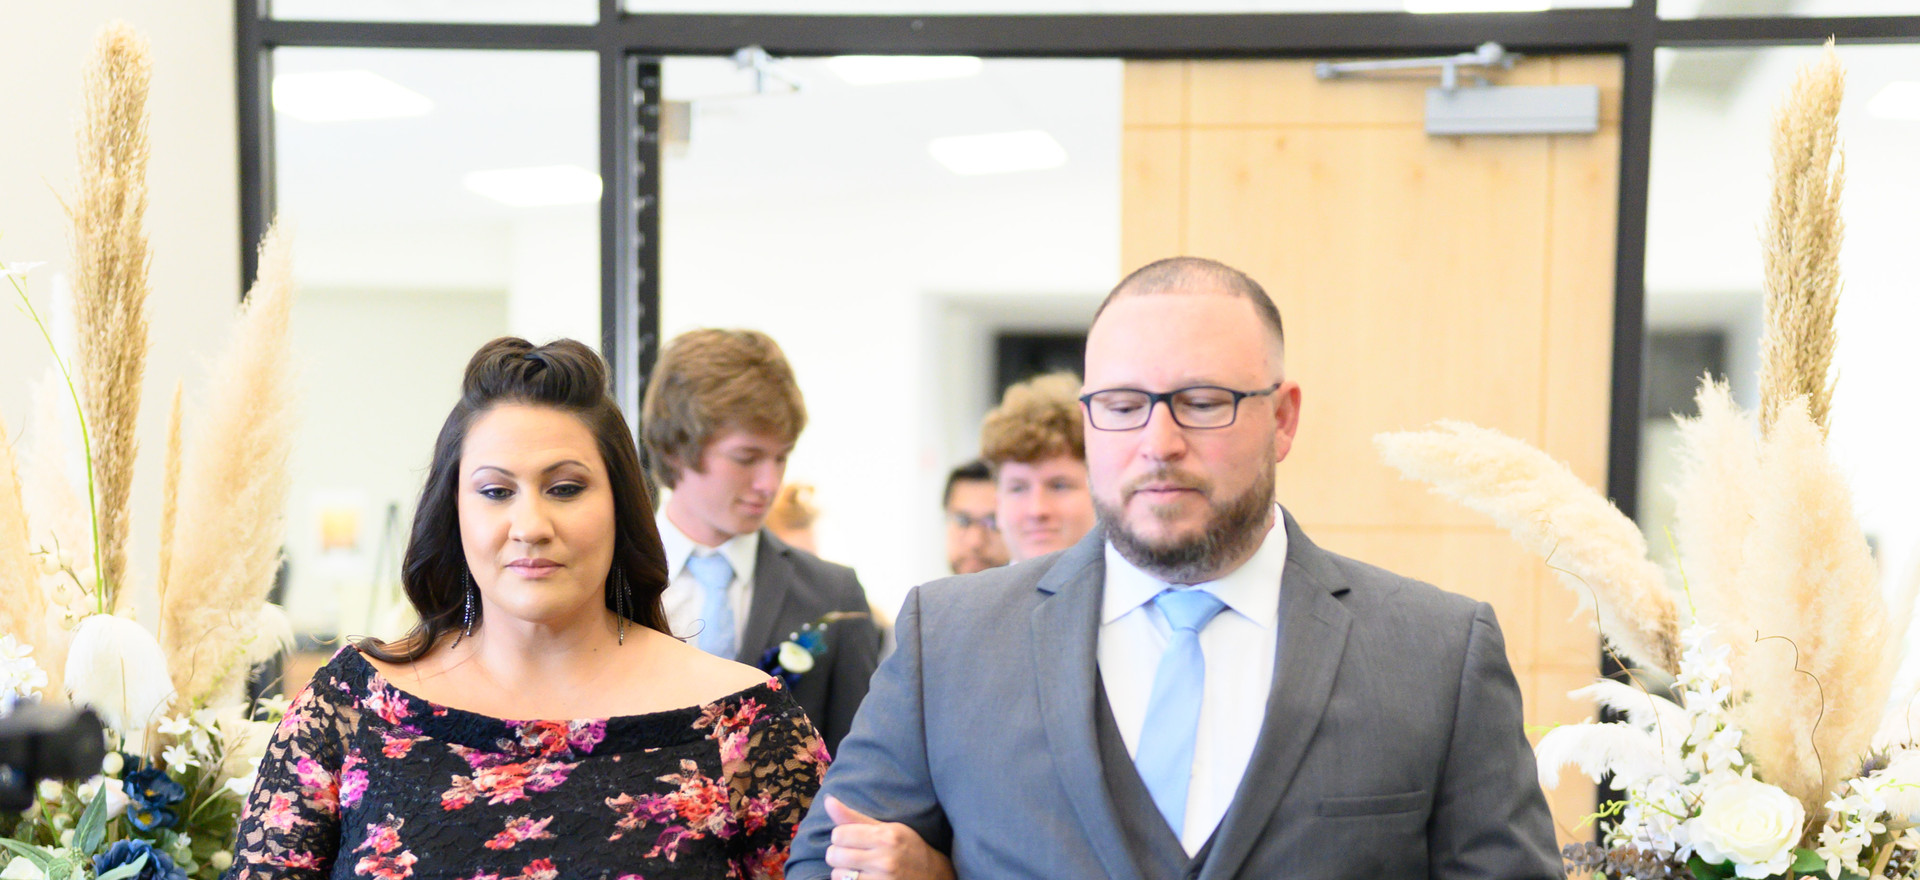 047_Lorena and Mike's Wedding day.jpg